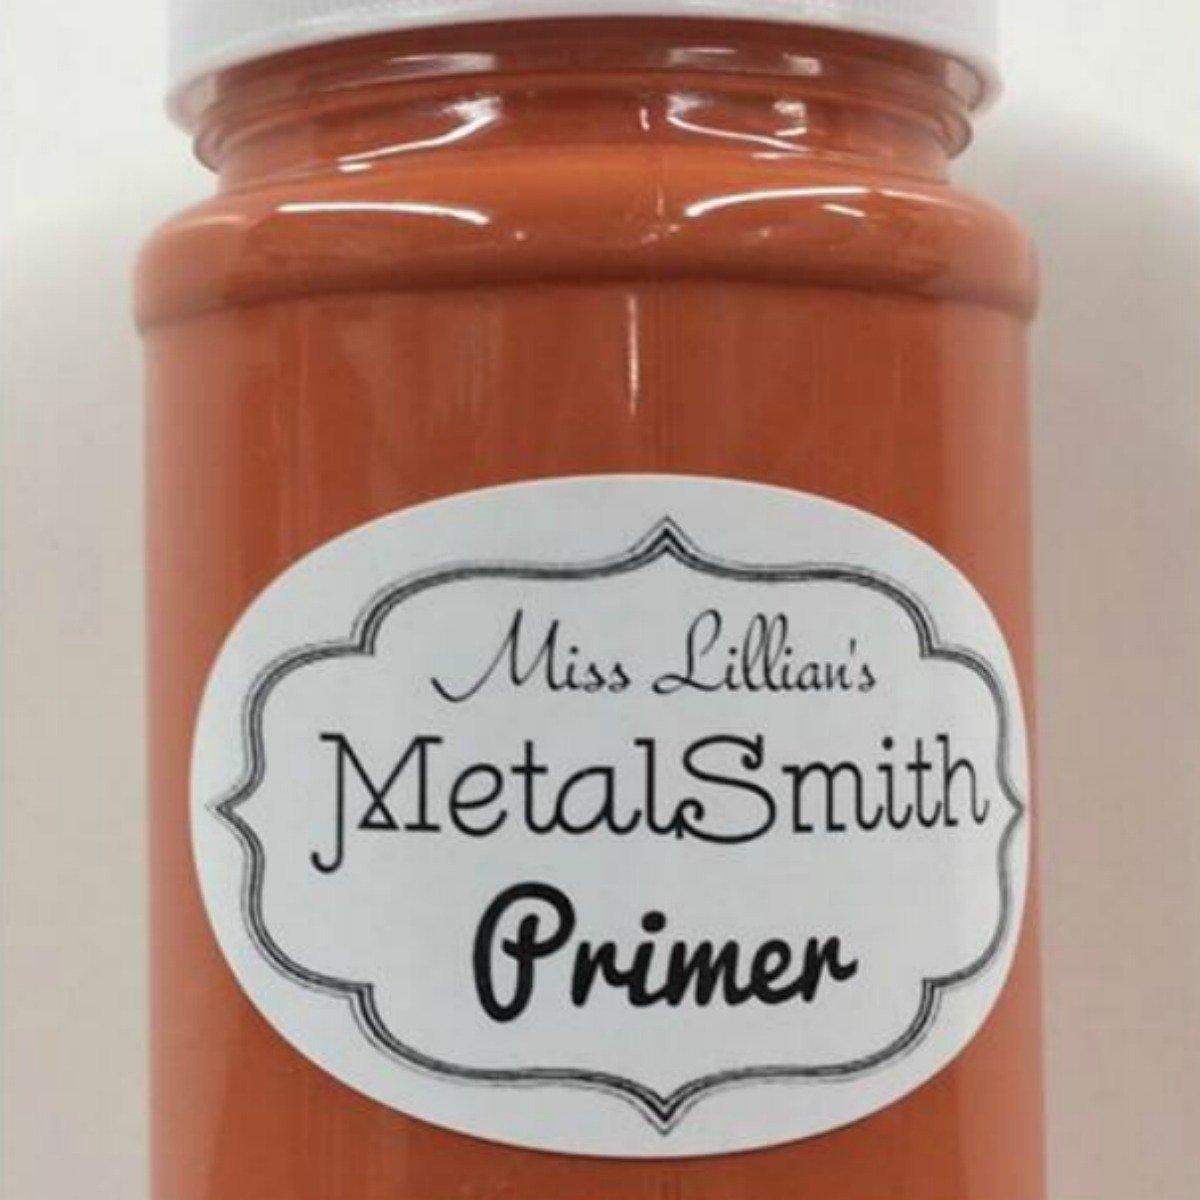 MetalSmith Primer - Website Cover Photo